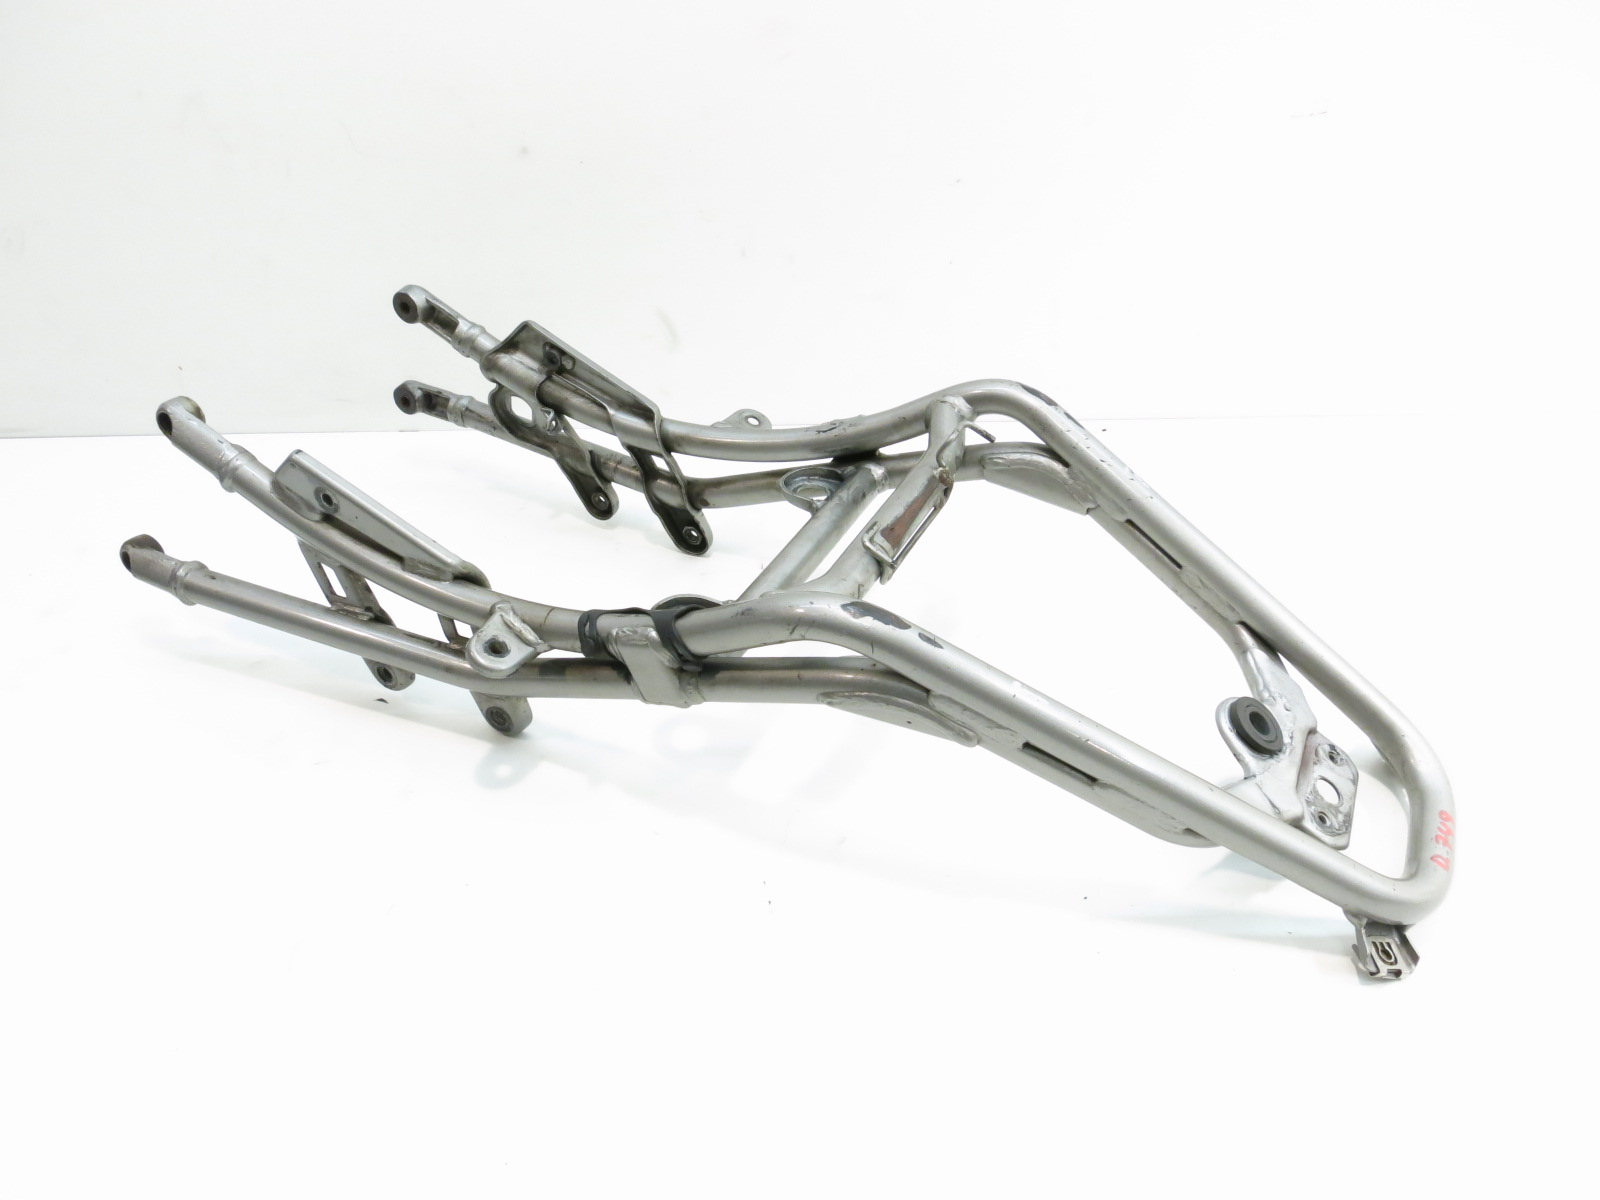 Ducati 749 999 Biposto Heckrahmen Rahmenheck Rahmen Hinten